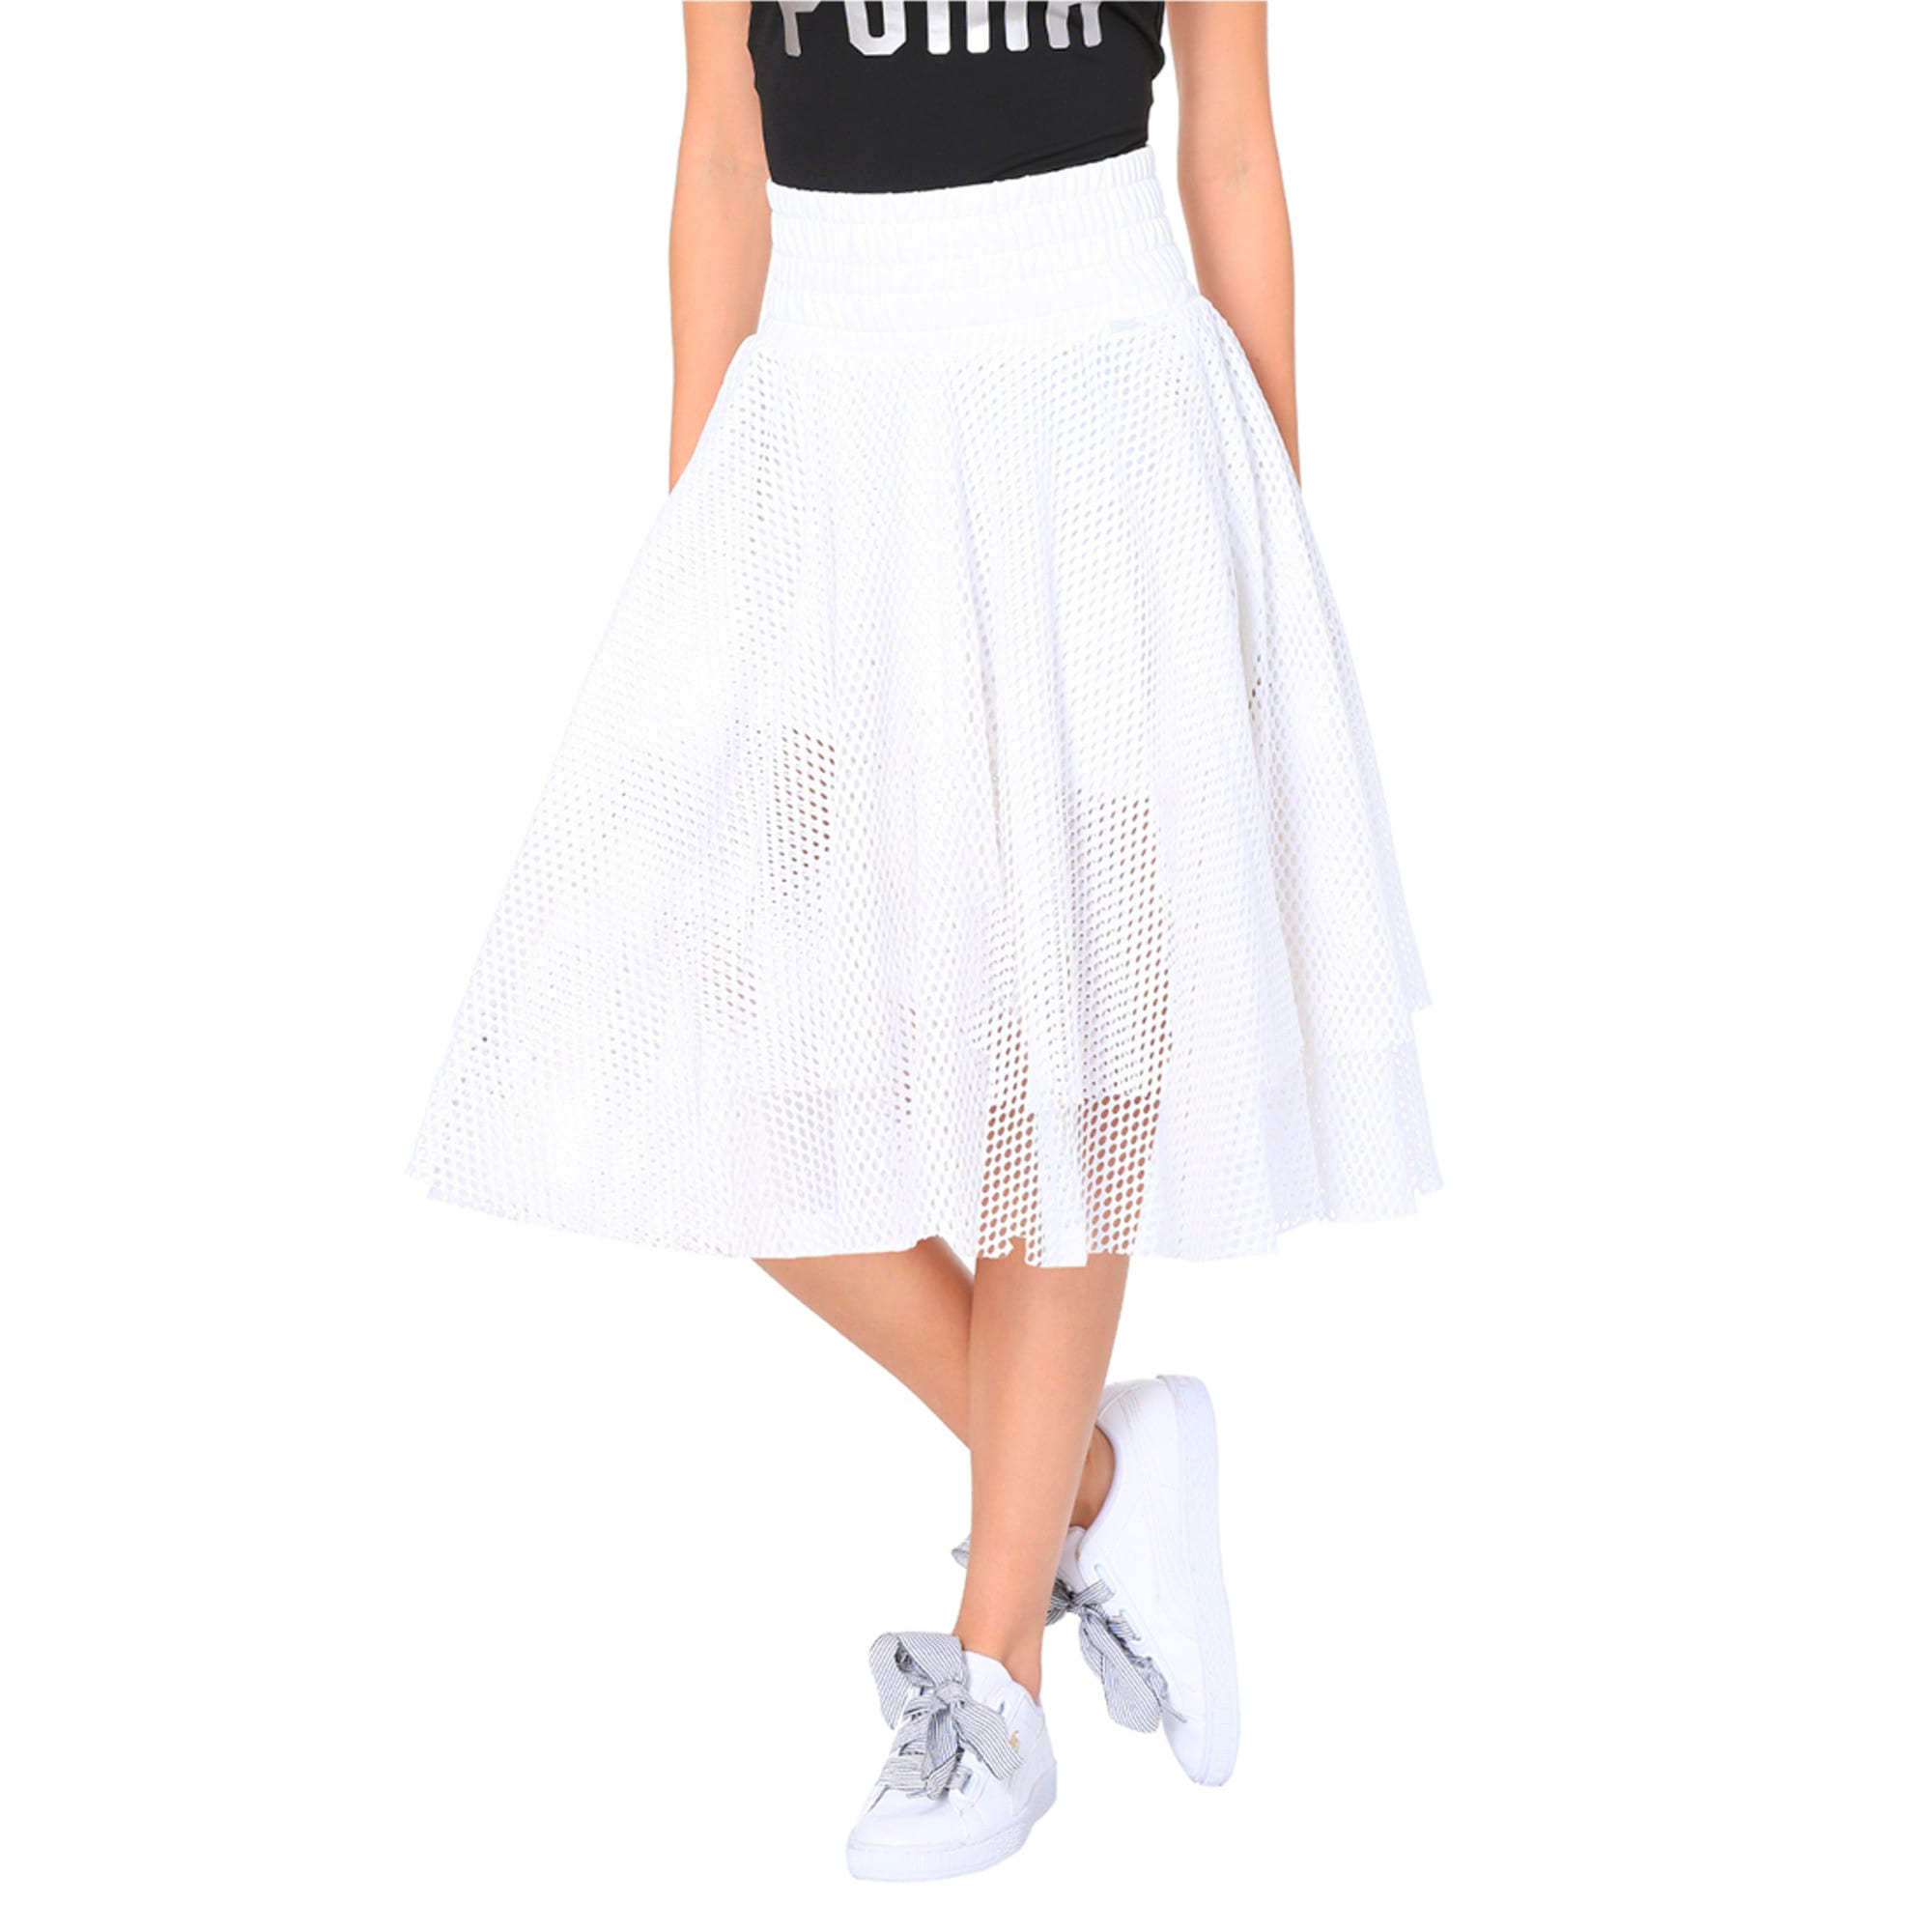 Thumbnail 1 of En Pointe Women's Skirt, Puma White, medium-IND